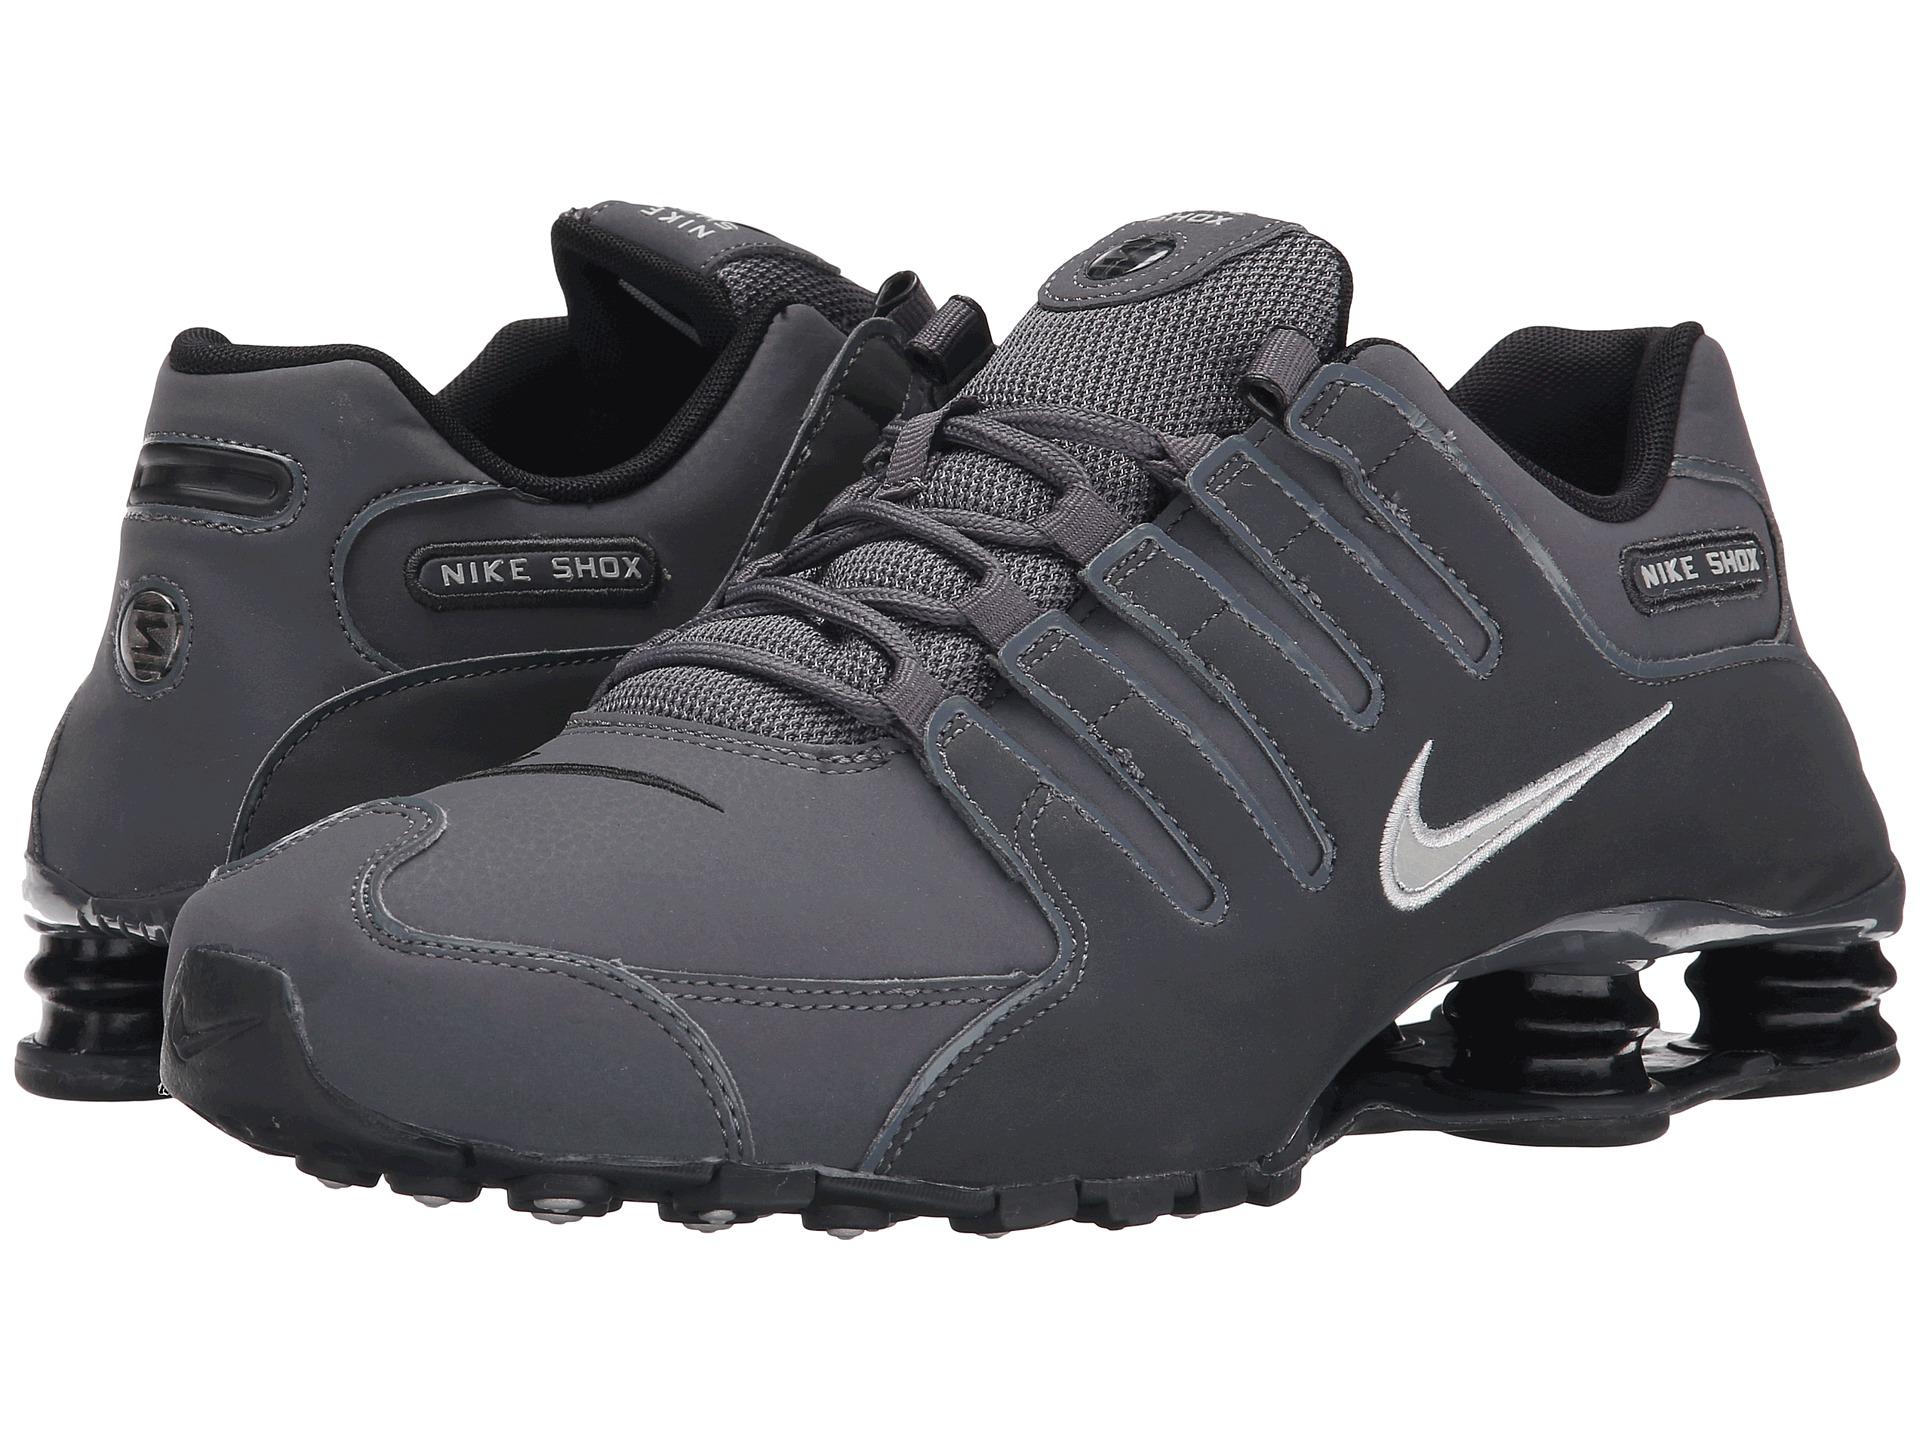 Nike Shox NZ Zapposcom Free Shipping BOTH Ways